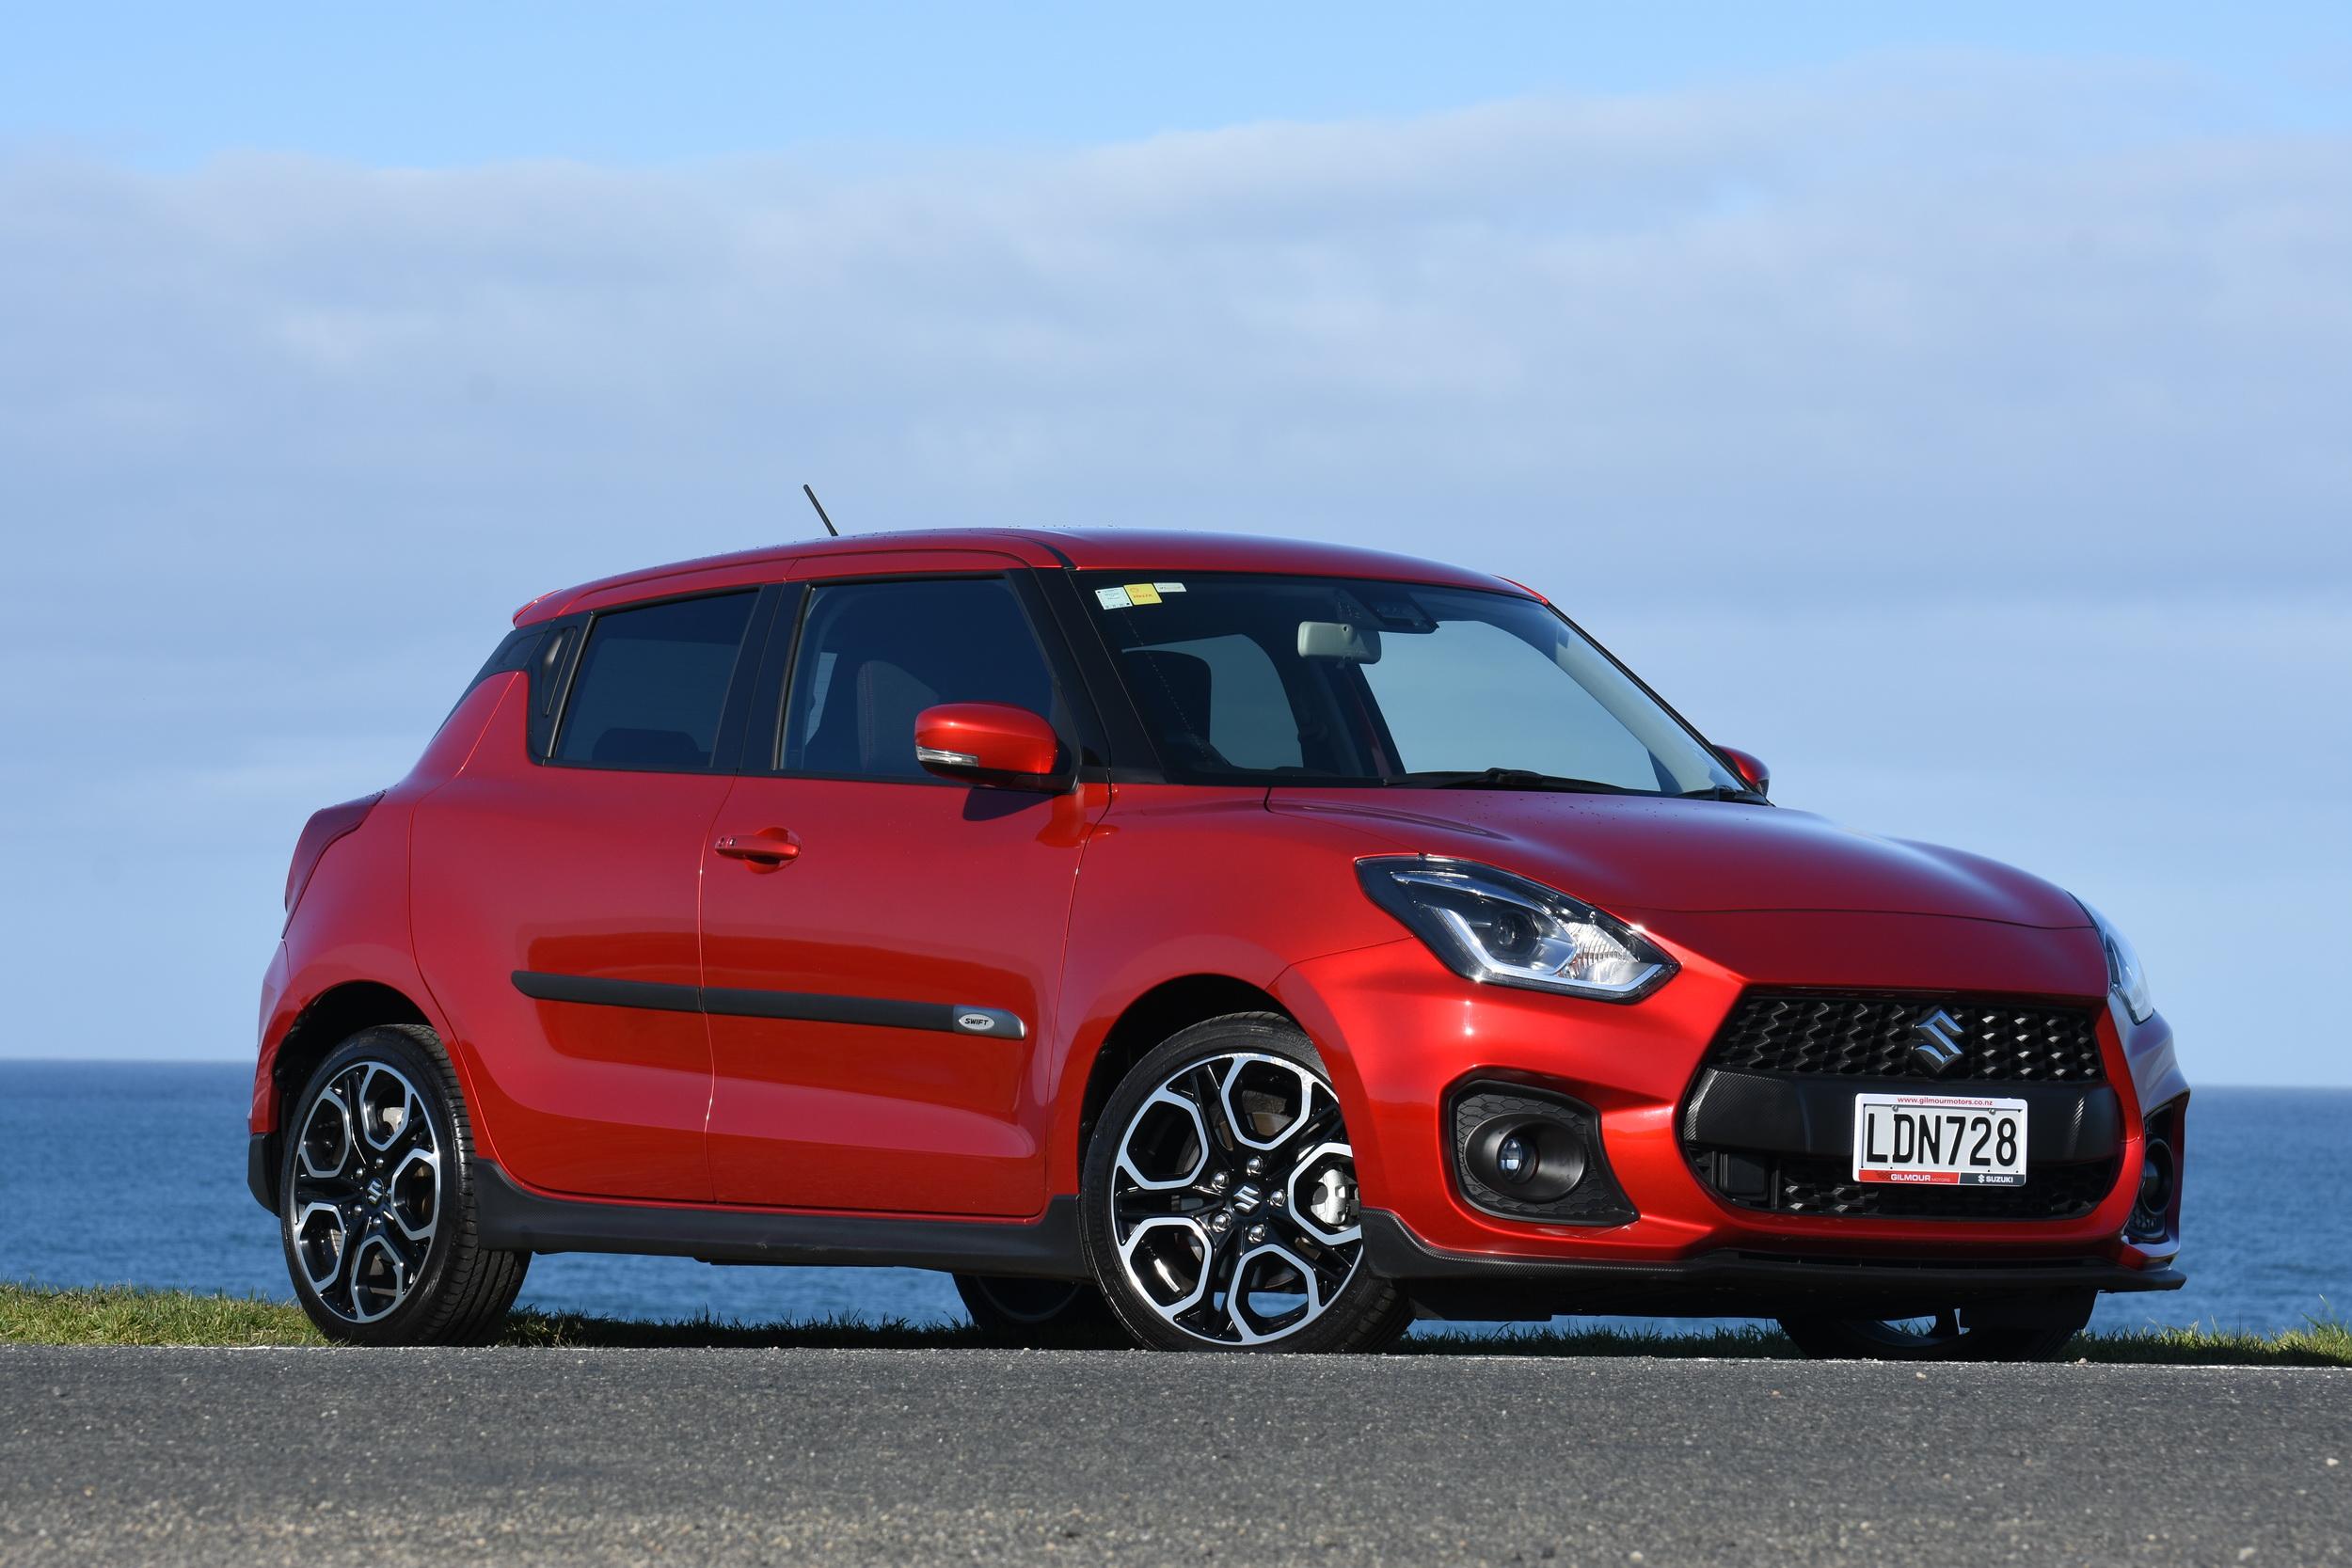 TWIST & SHOUT - The latest Suzuki Swift Sport